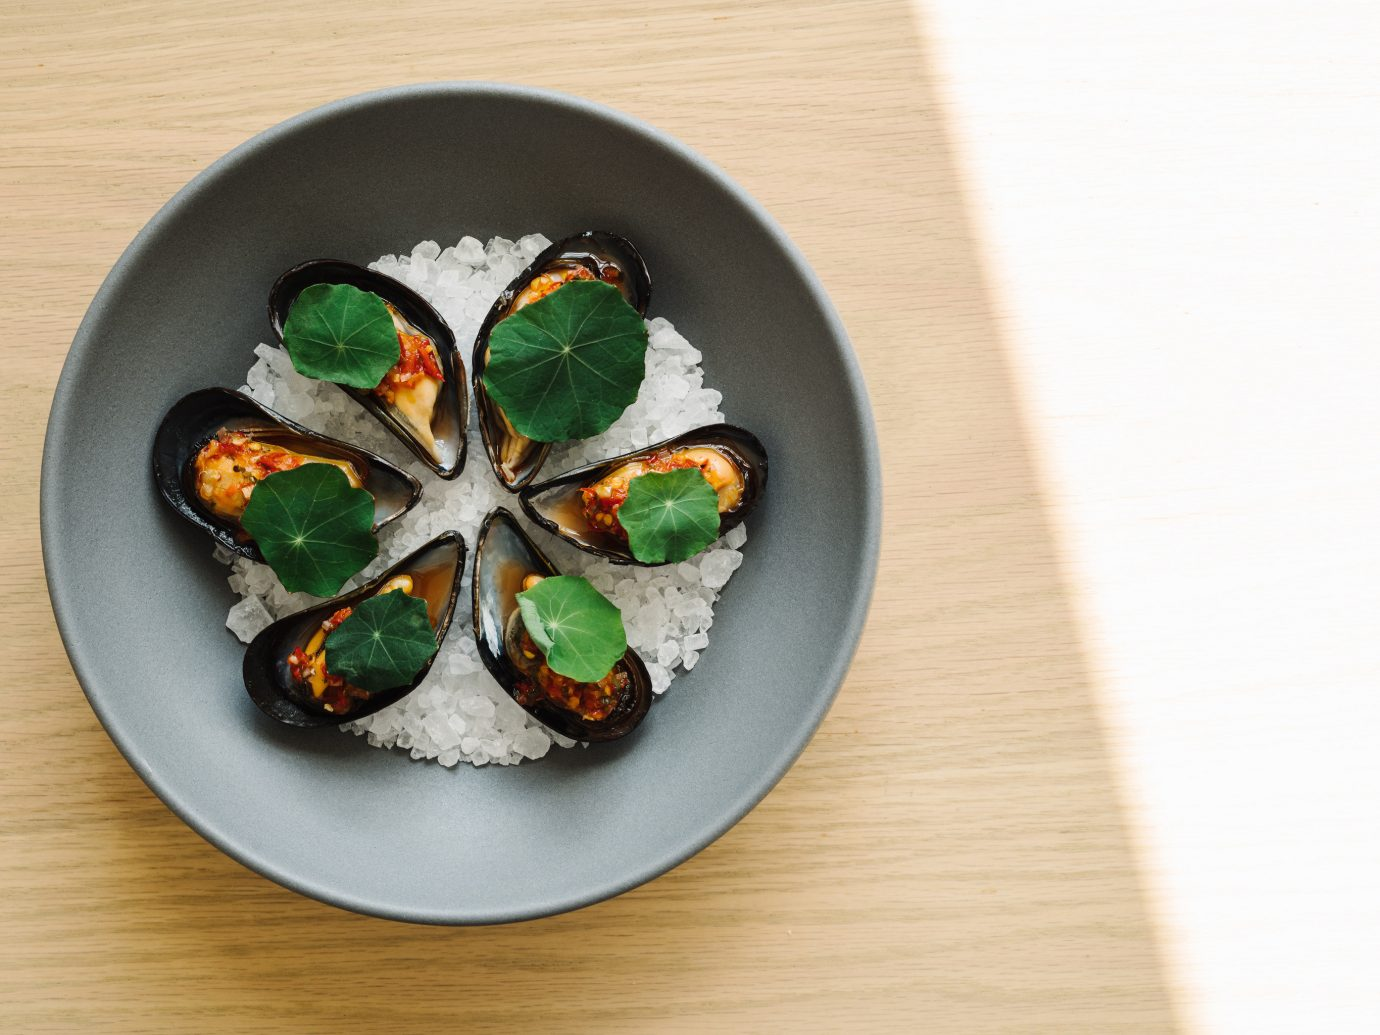 Trip Ideas Weekend Getaways table plate green leaf food jewellery fashion accessory produce flower vegetable